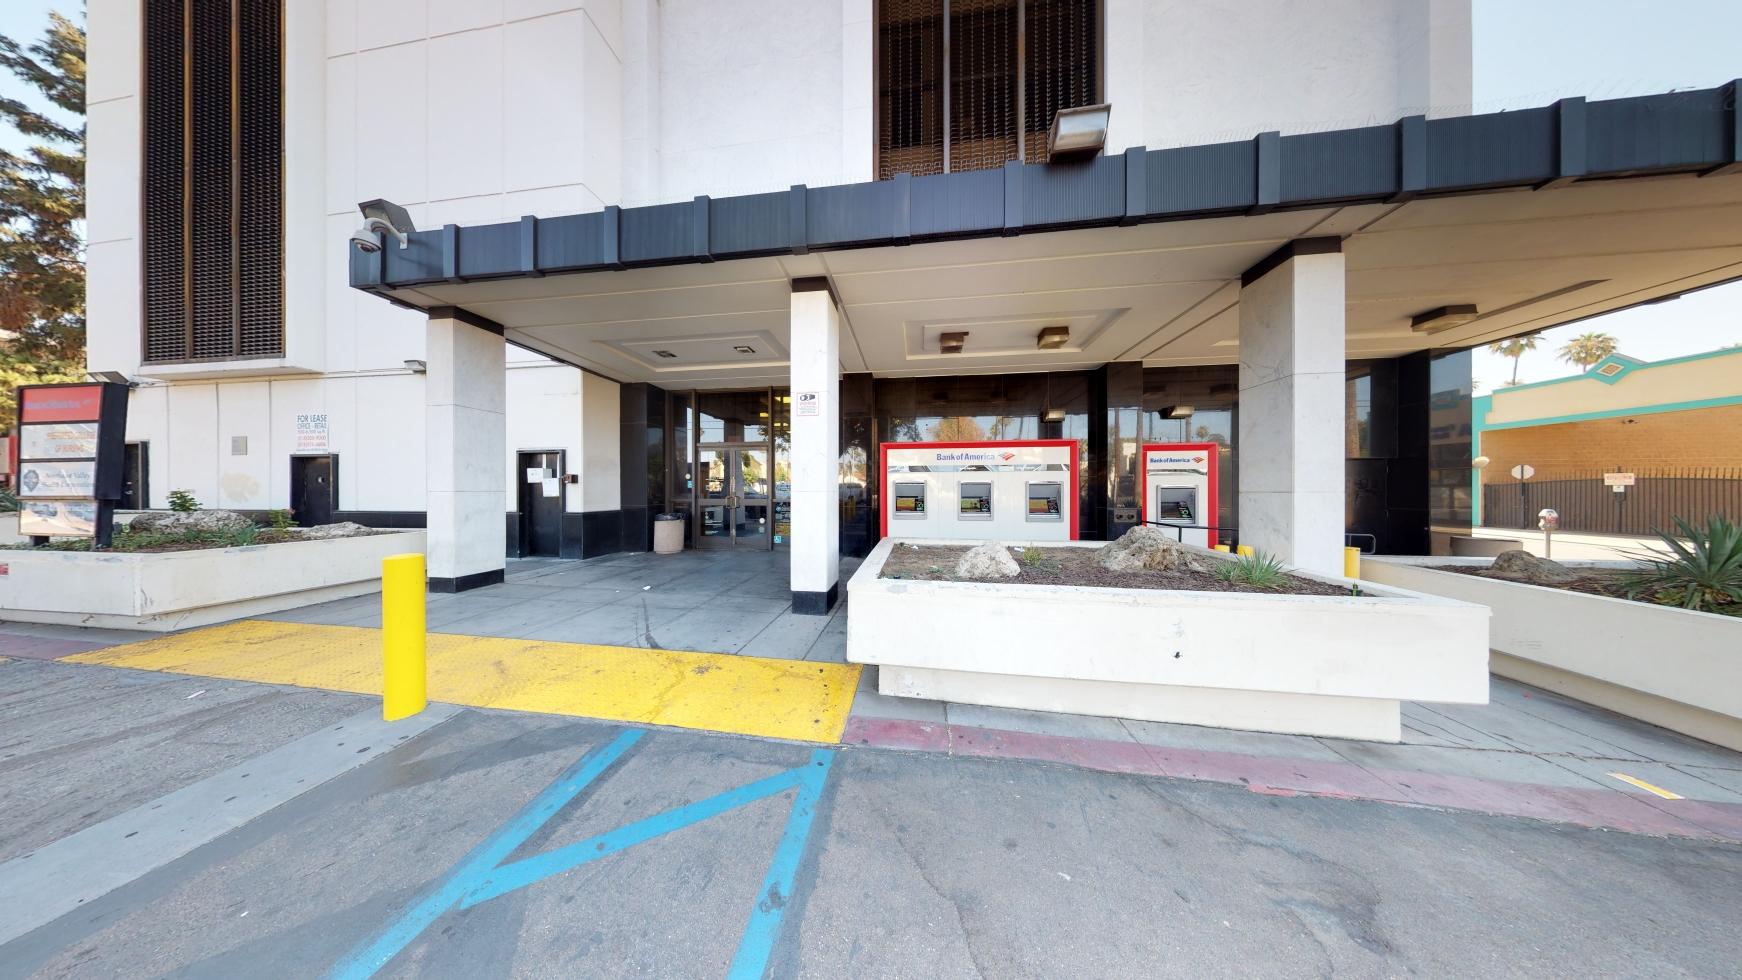 Bank of America financial center with walk-up ATM | 6551 Van Nuys Blvd, Van Nuys, CA 91401